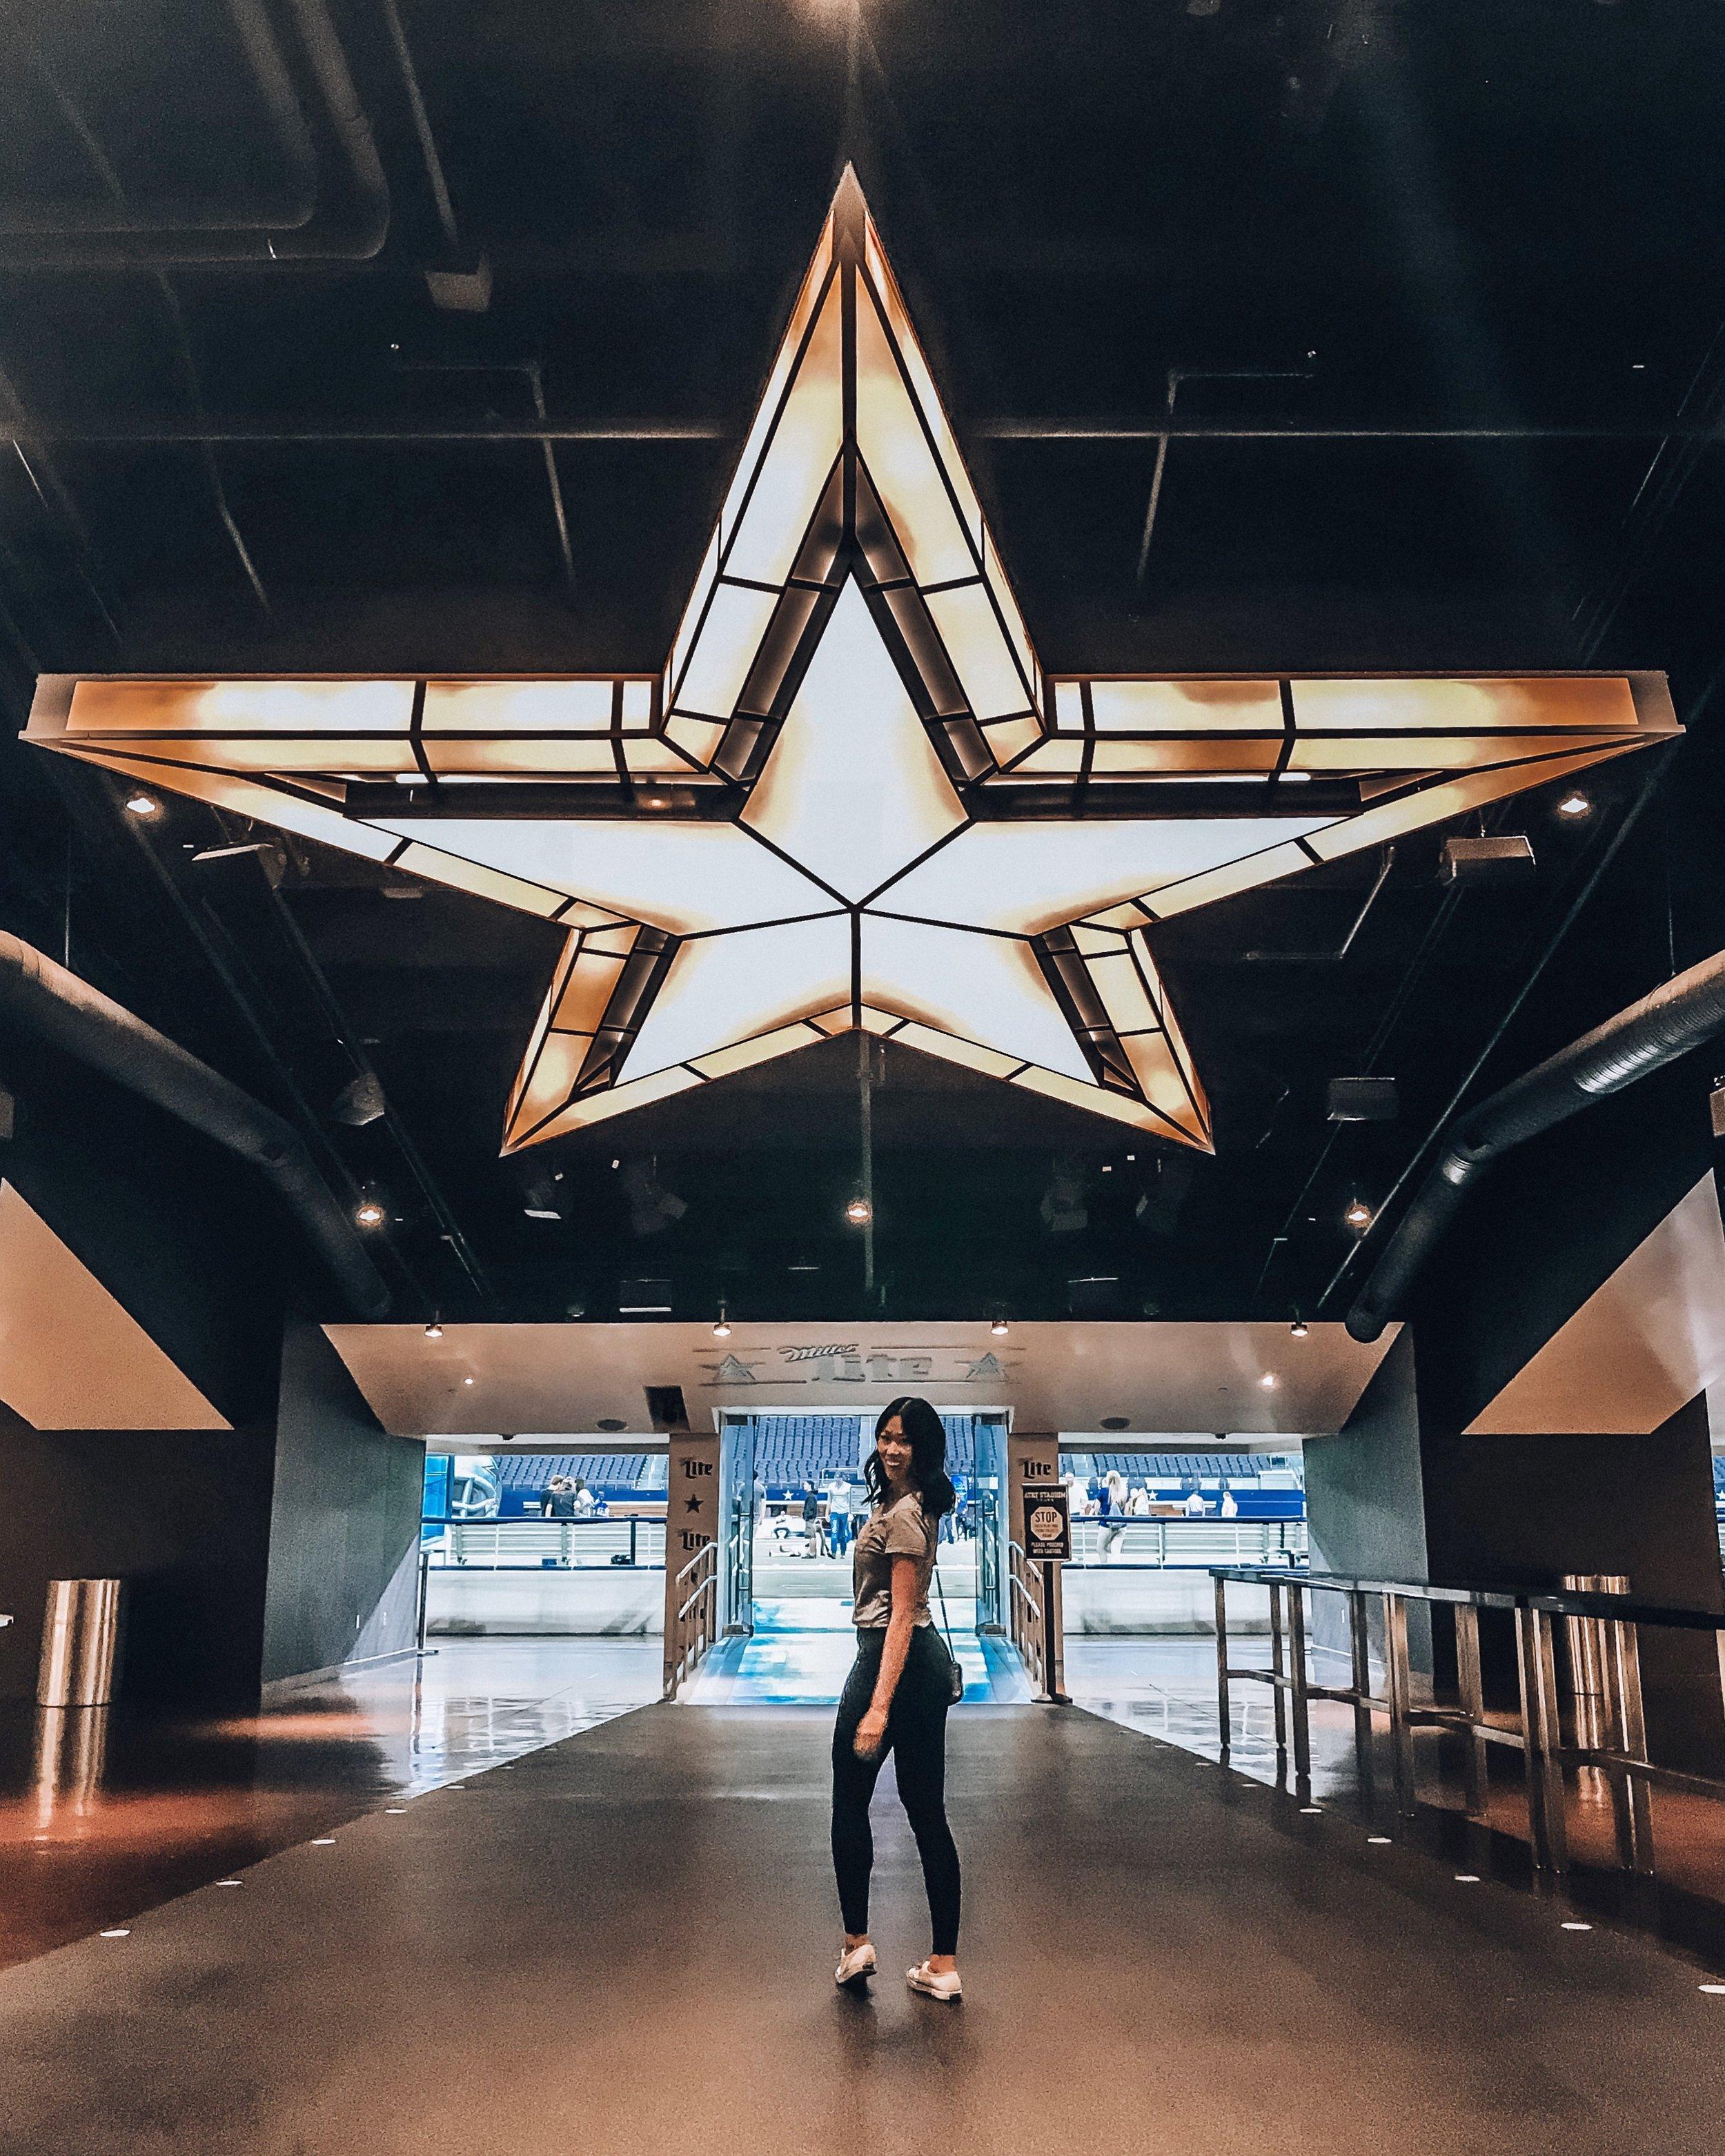 ATT Stadium - Jerry's world in Dallas, Texas